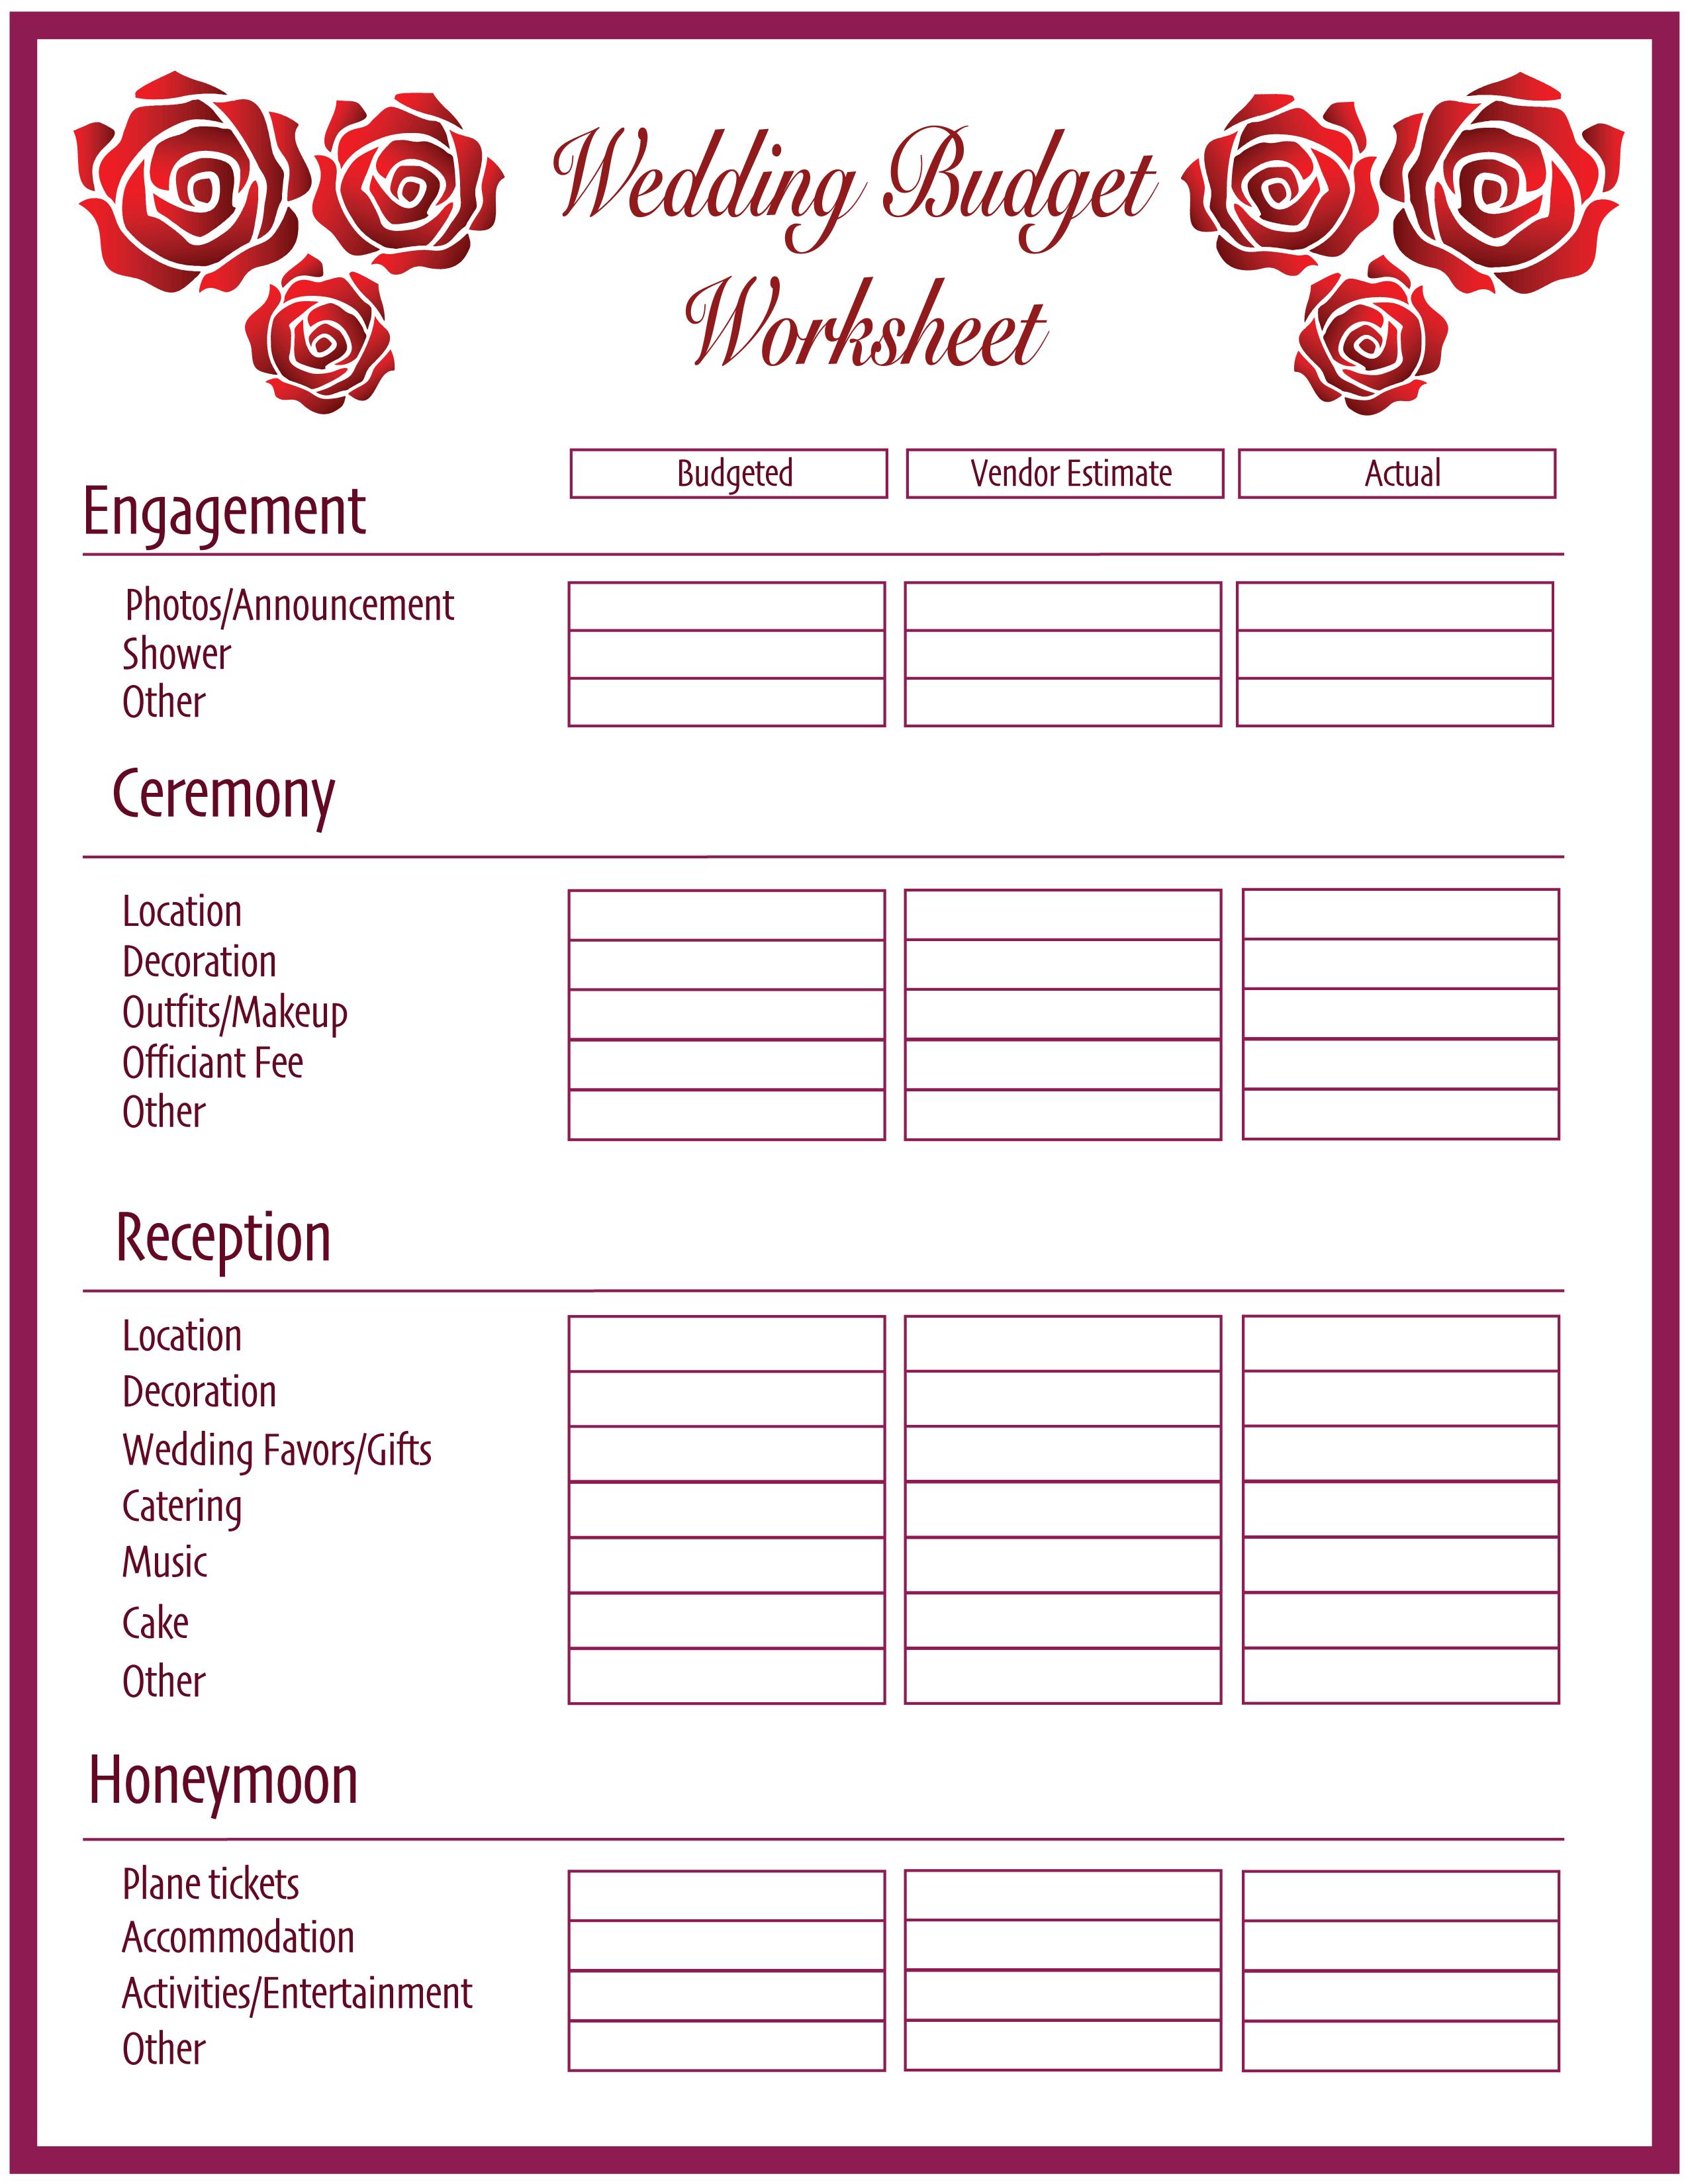 Free Printable Wedding Budget Planner And Worksheet